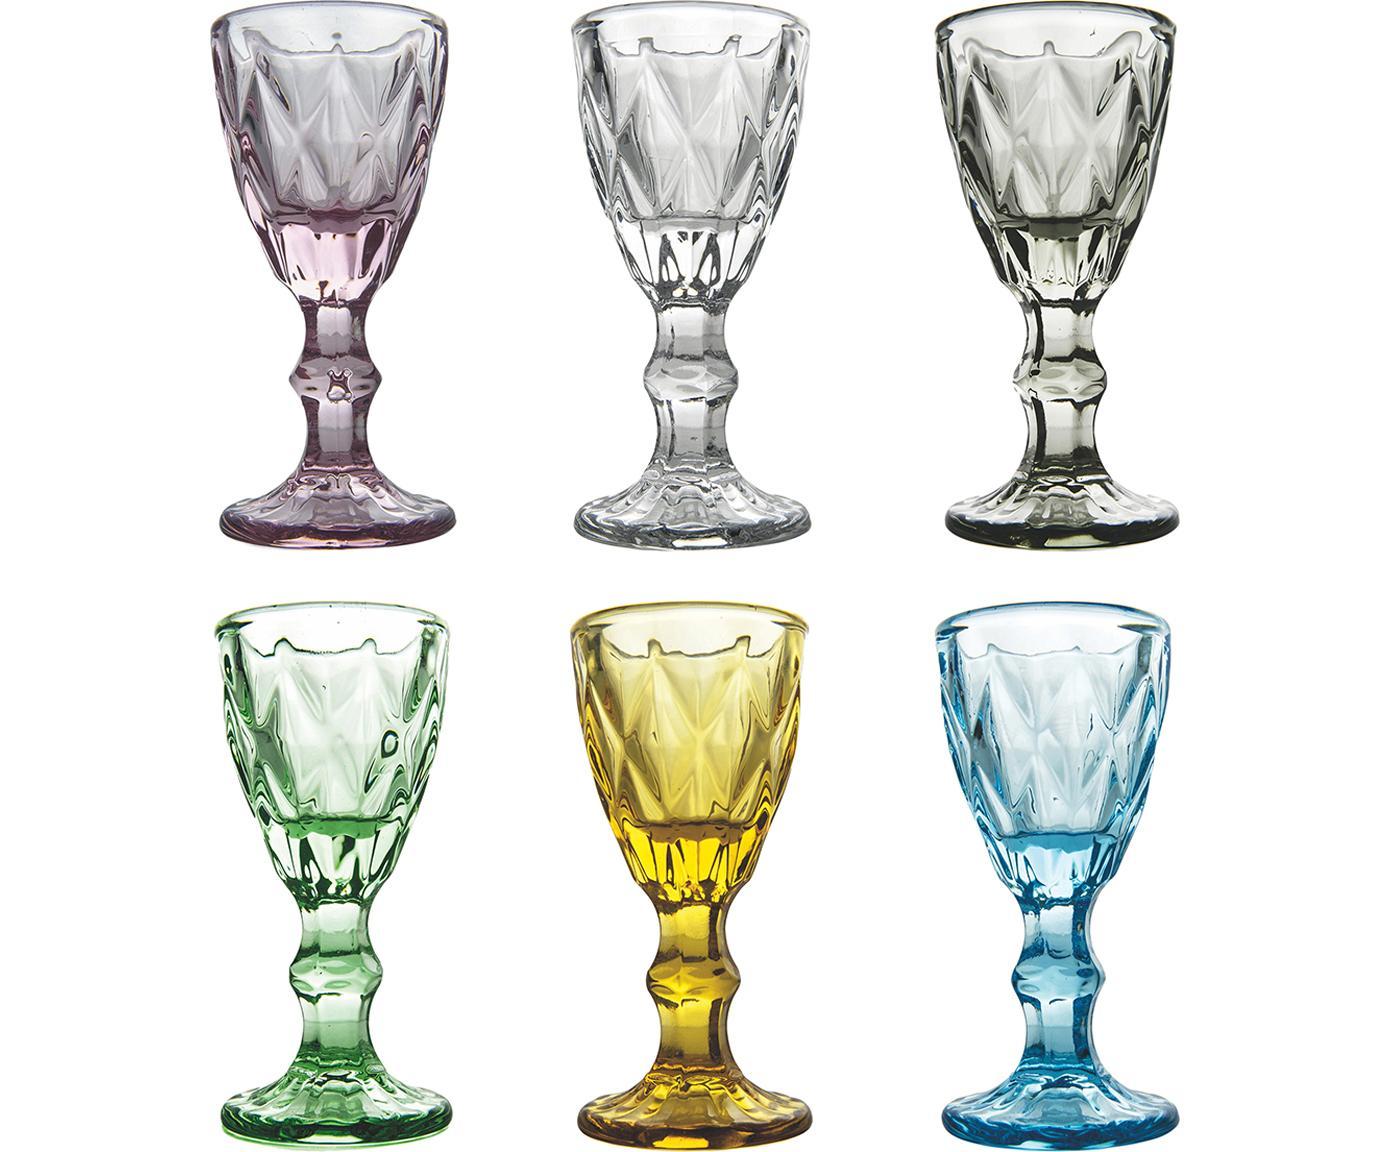 Borrelglaasjesset Prisma, 6-delig, Glas, Multicolour, Ø 5 x H 11 cm